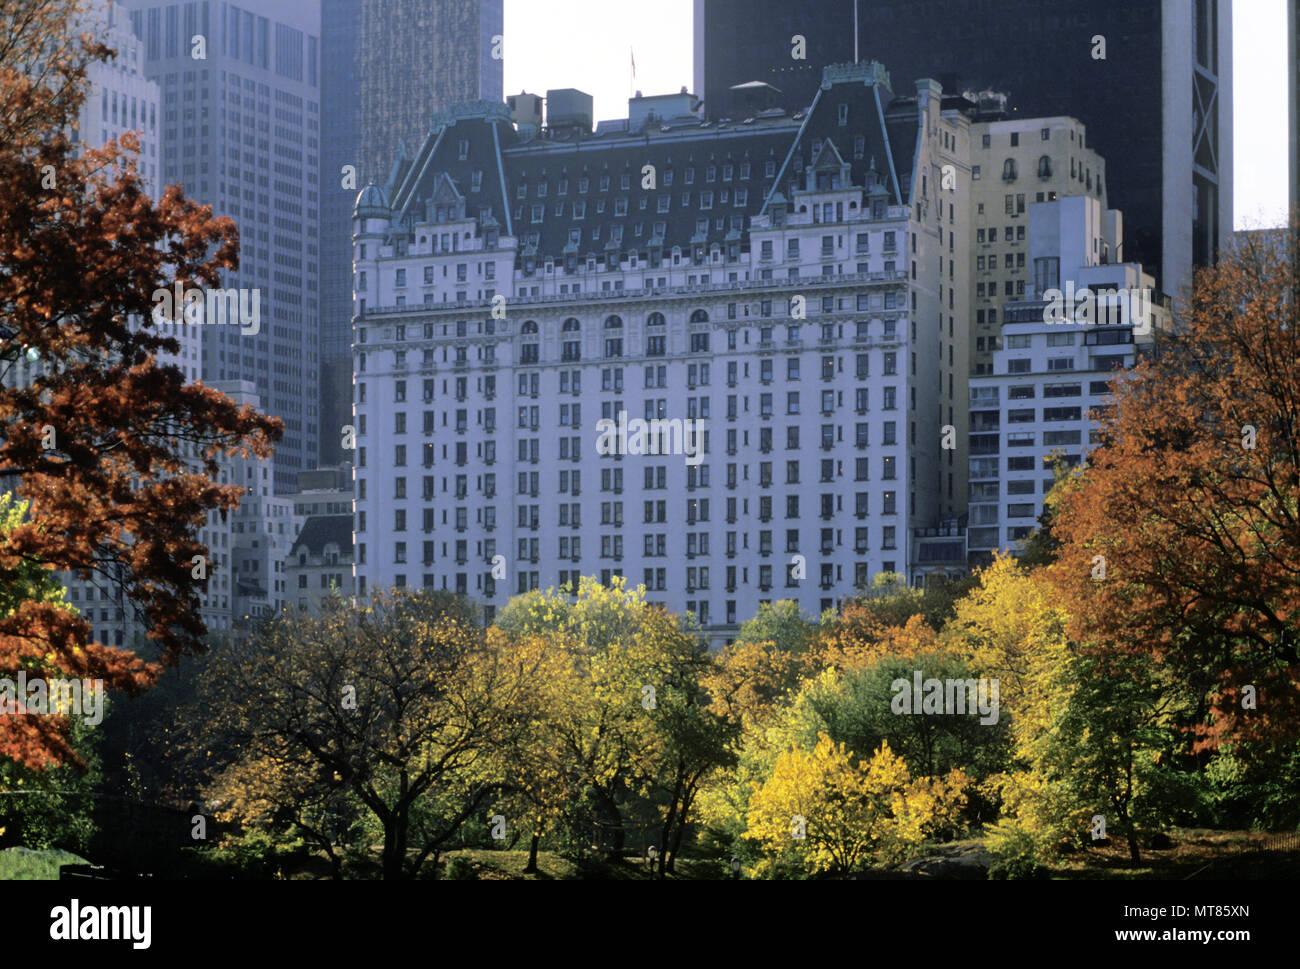 1988 HISTORICAL FALL FOLIAGE PLAZA HOTEL CENTRAL PARK SOUTH MANHATTAN NEW YORK CITY USA - Stock Image